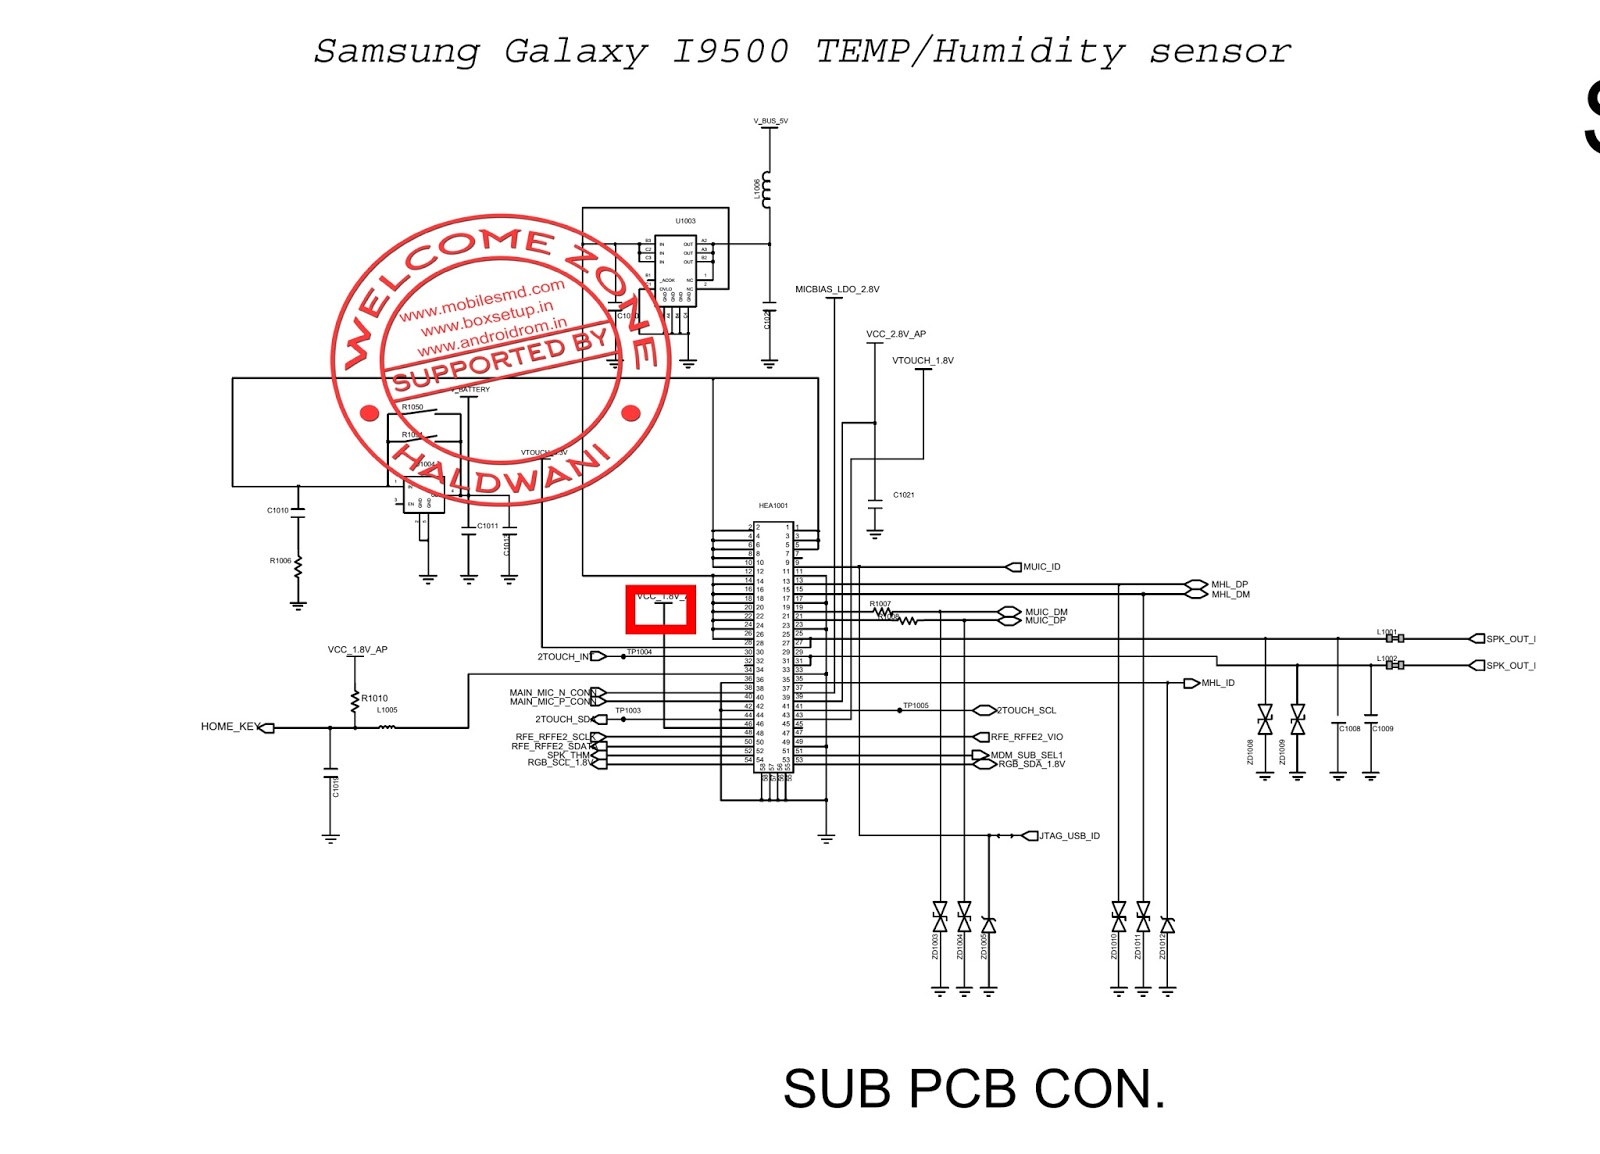 Samsung Galaxy S4 I Temp Humidity Sensor Not Working